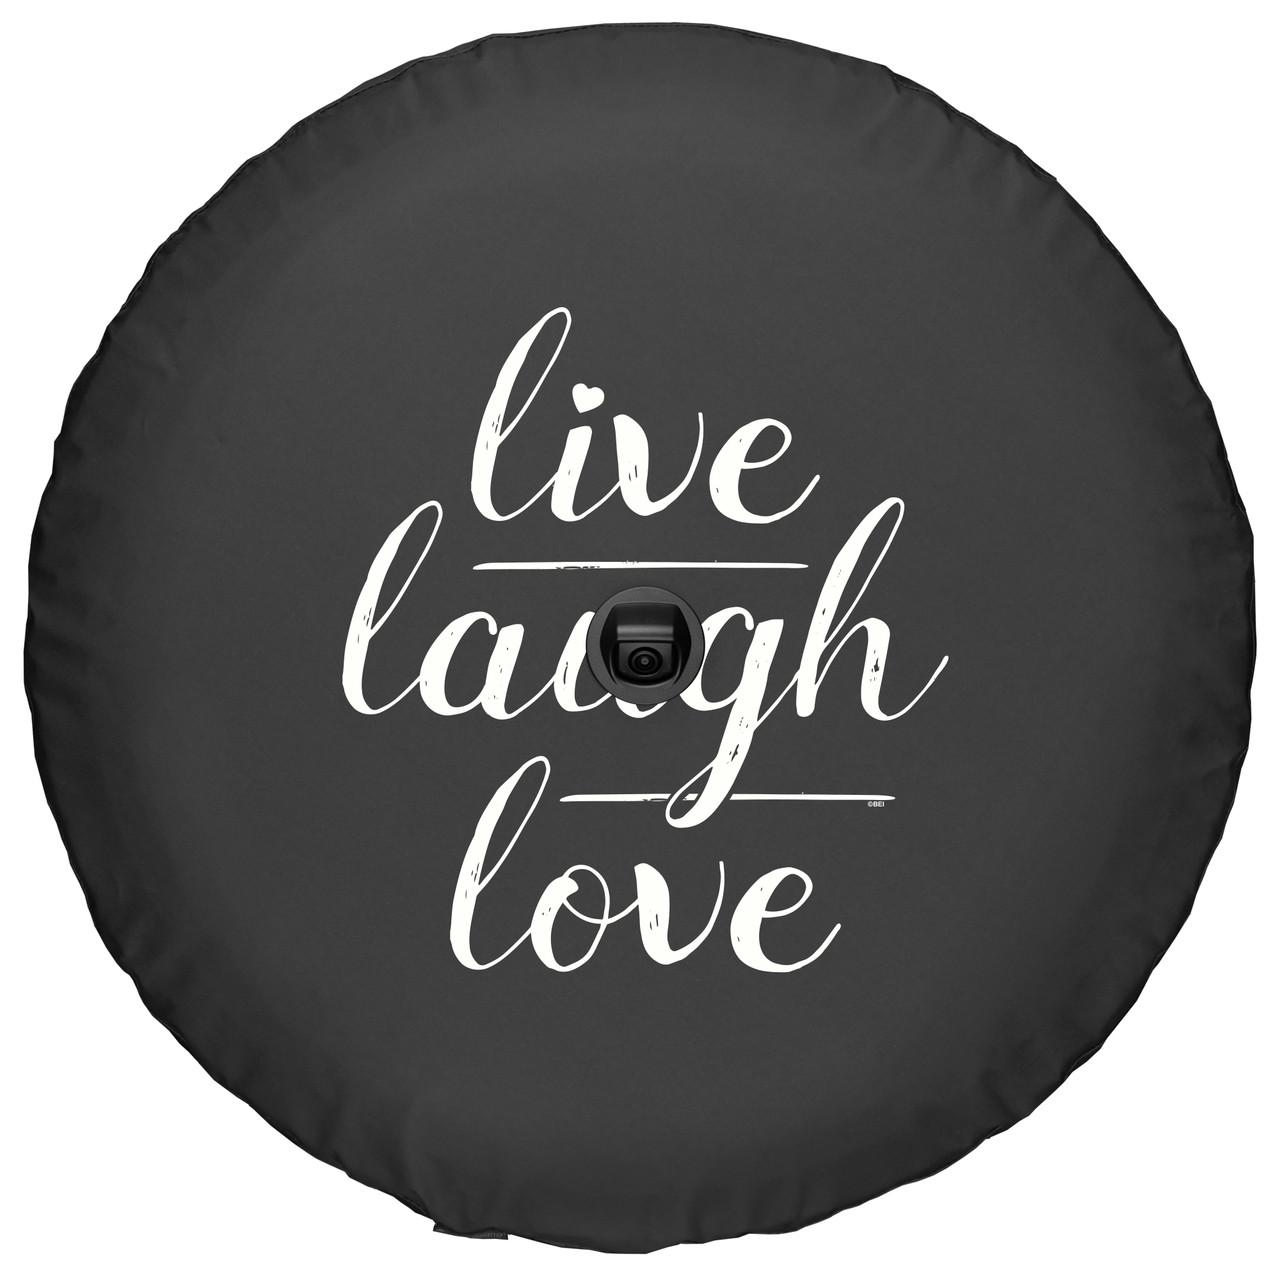 Jeep Wrangler JL - Soft Tire Cover - Live Love Laugh